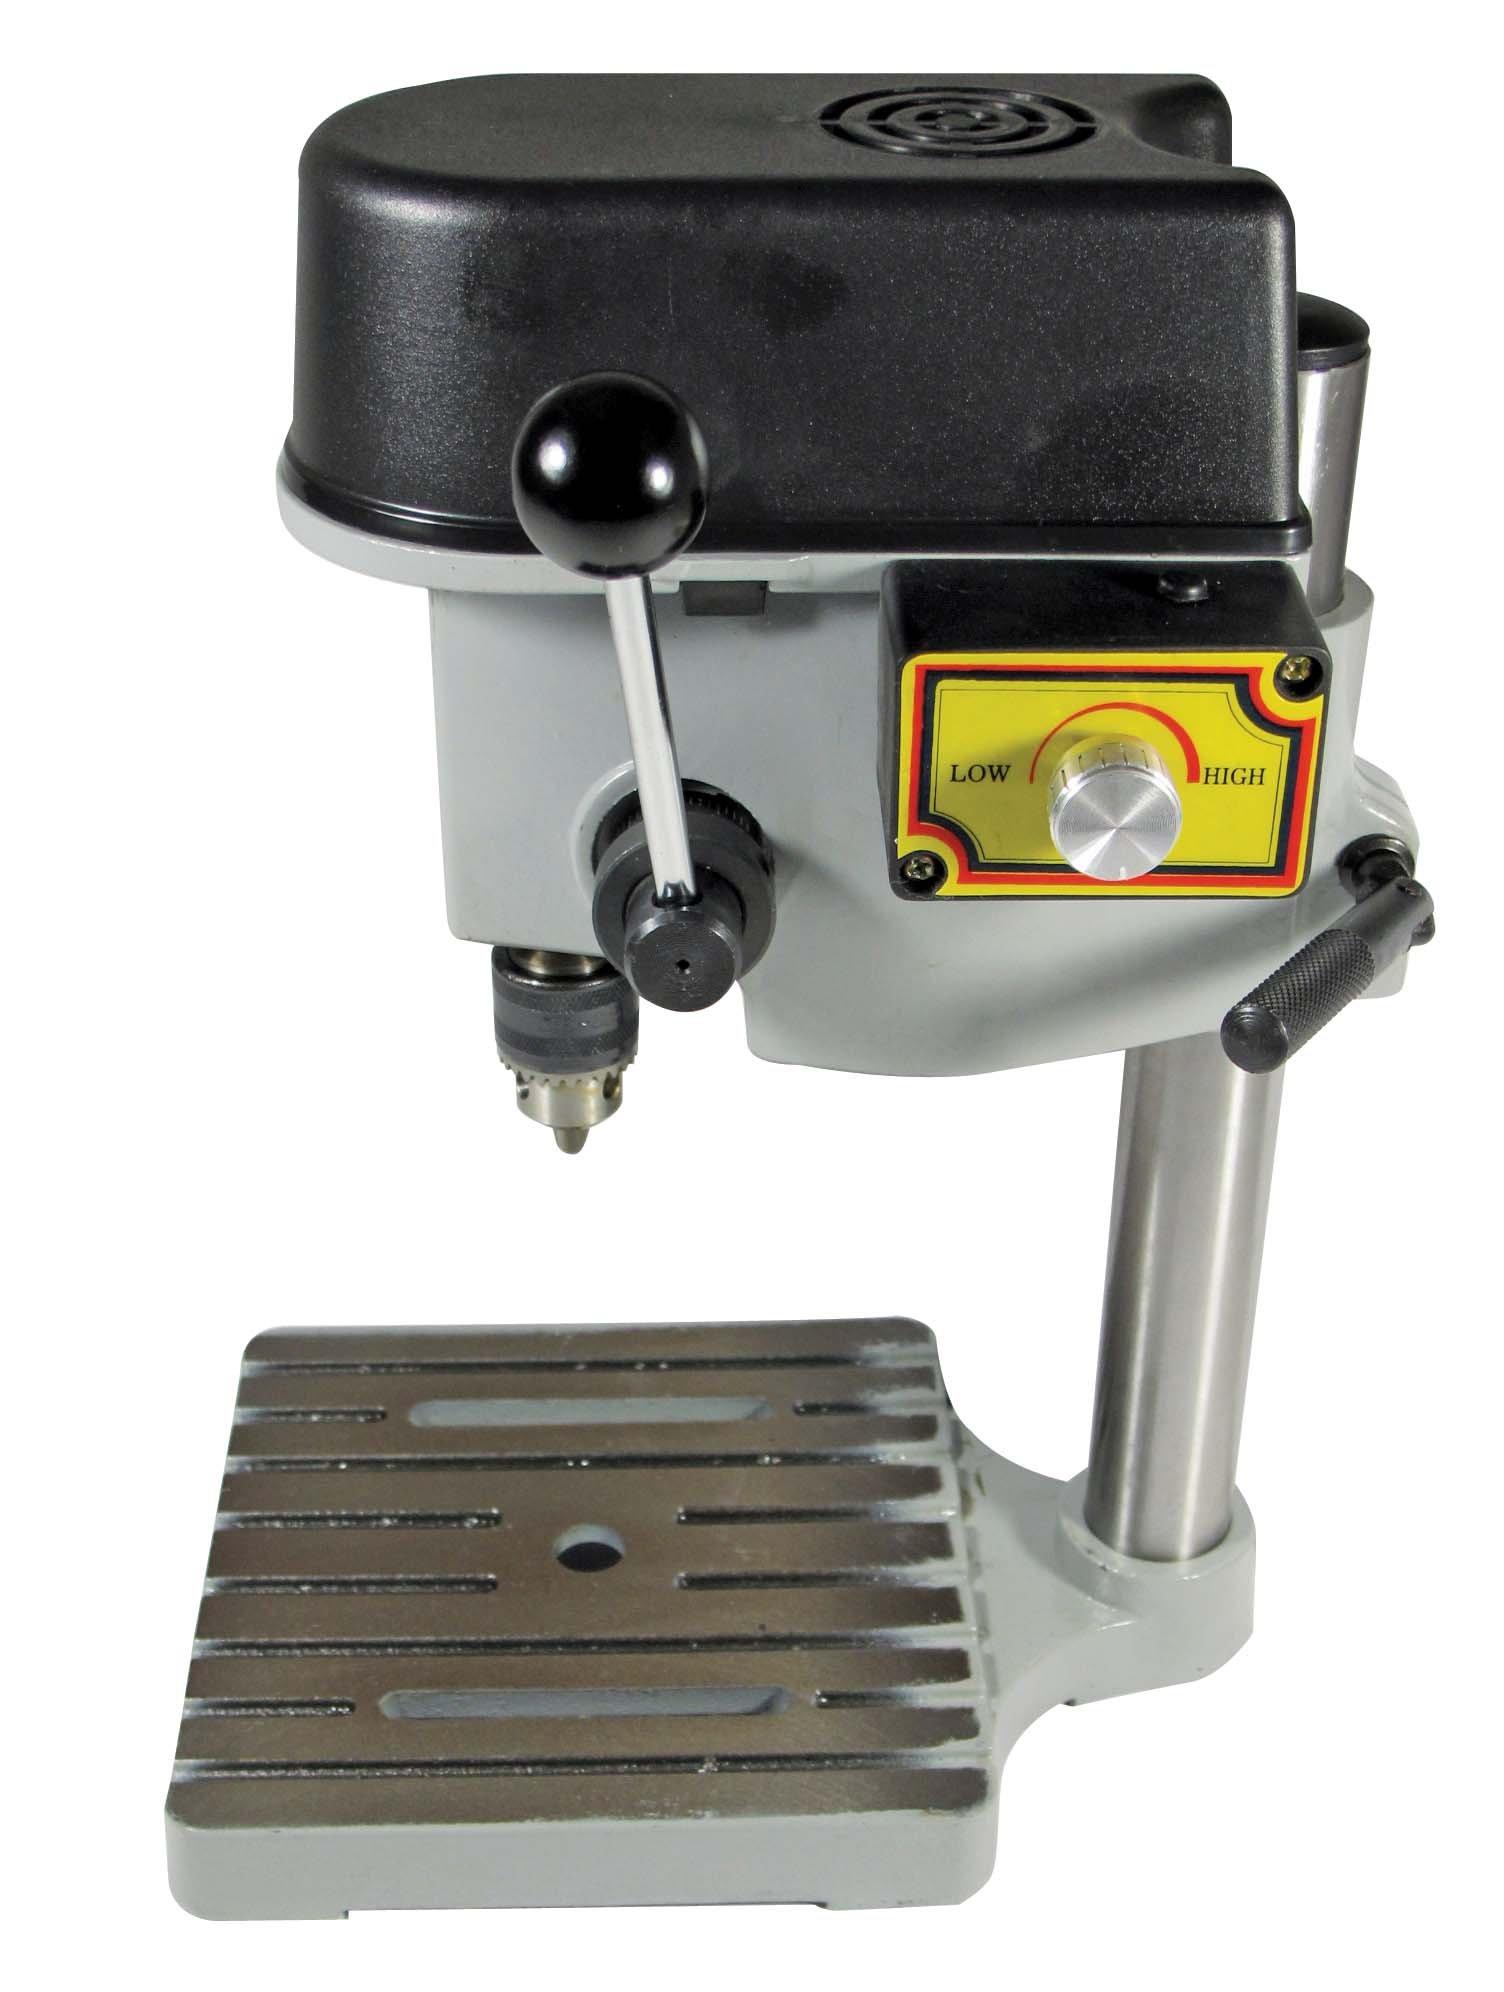 SE 3-Speed Mini Drill Press Bench by SE (Image #6)